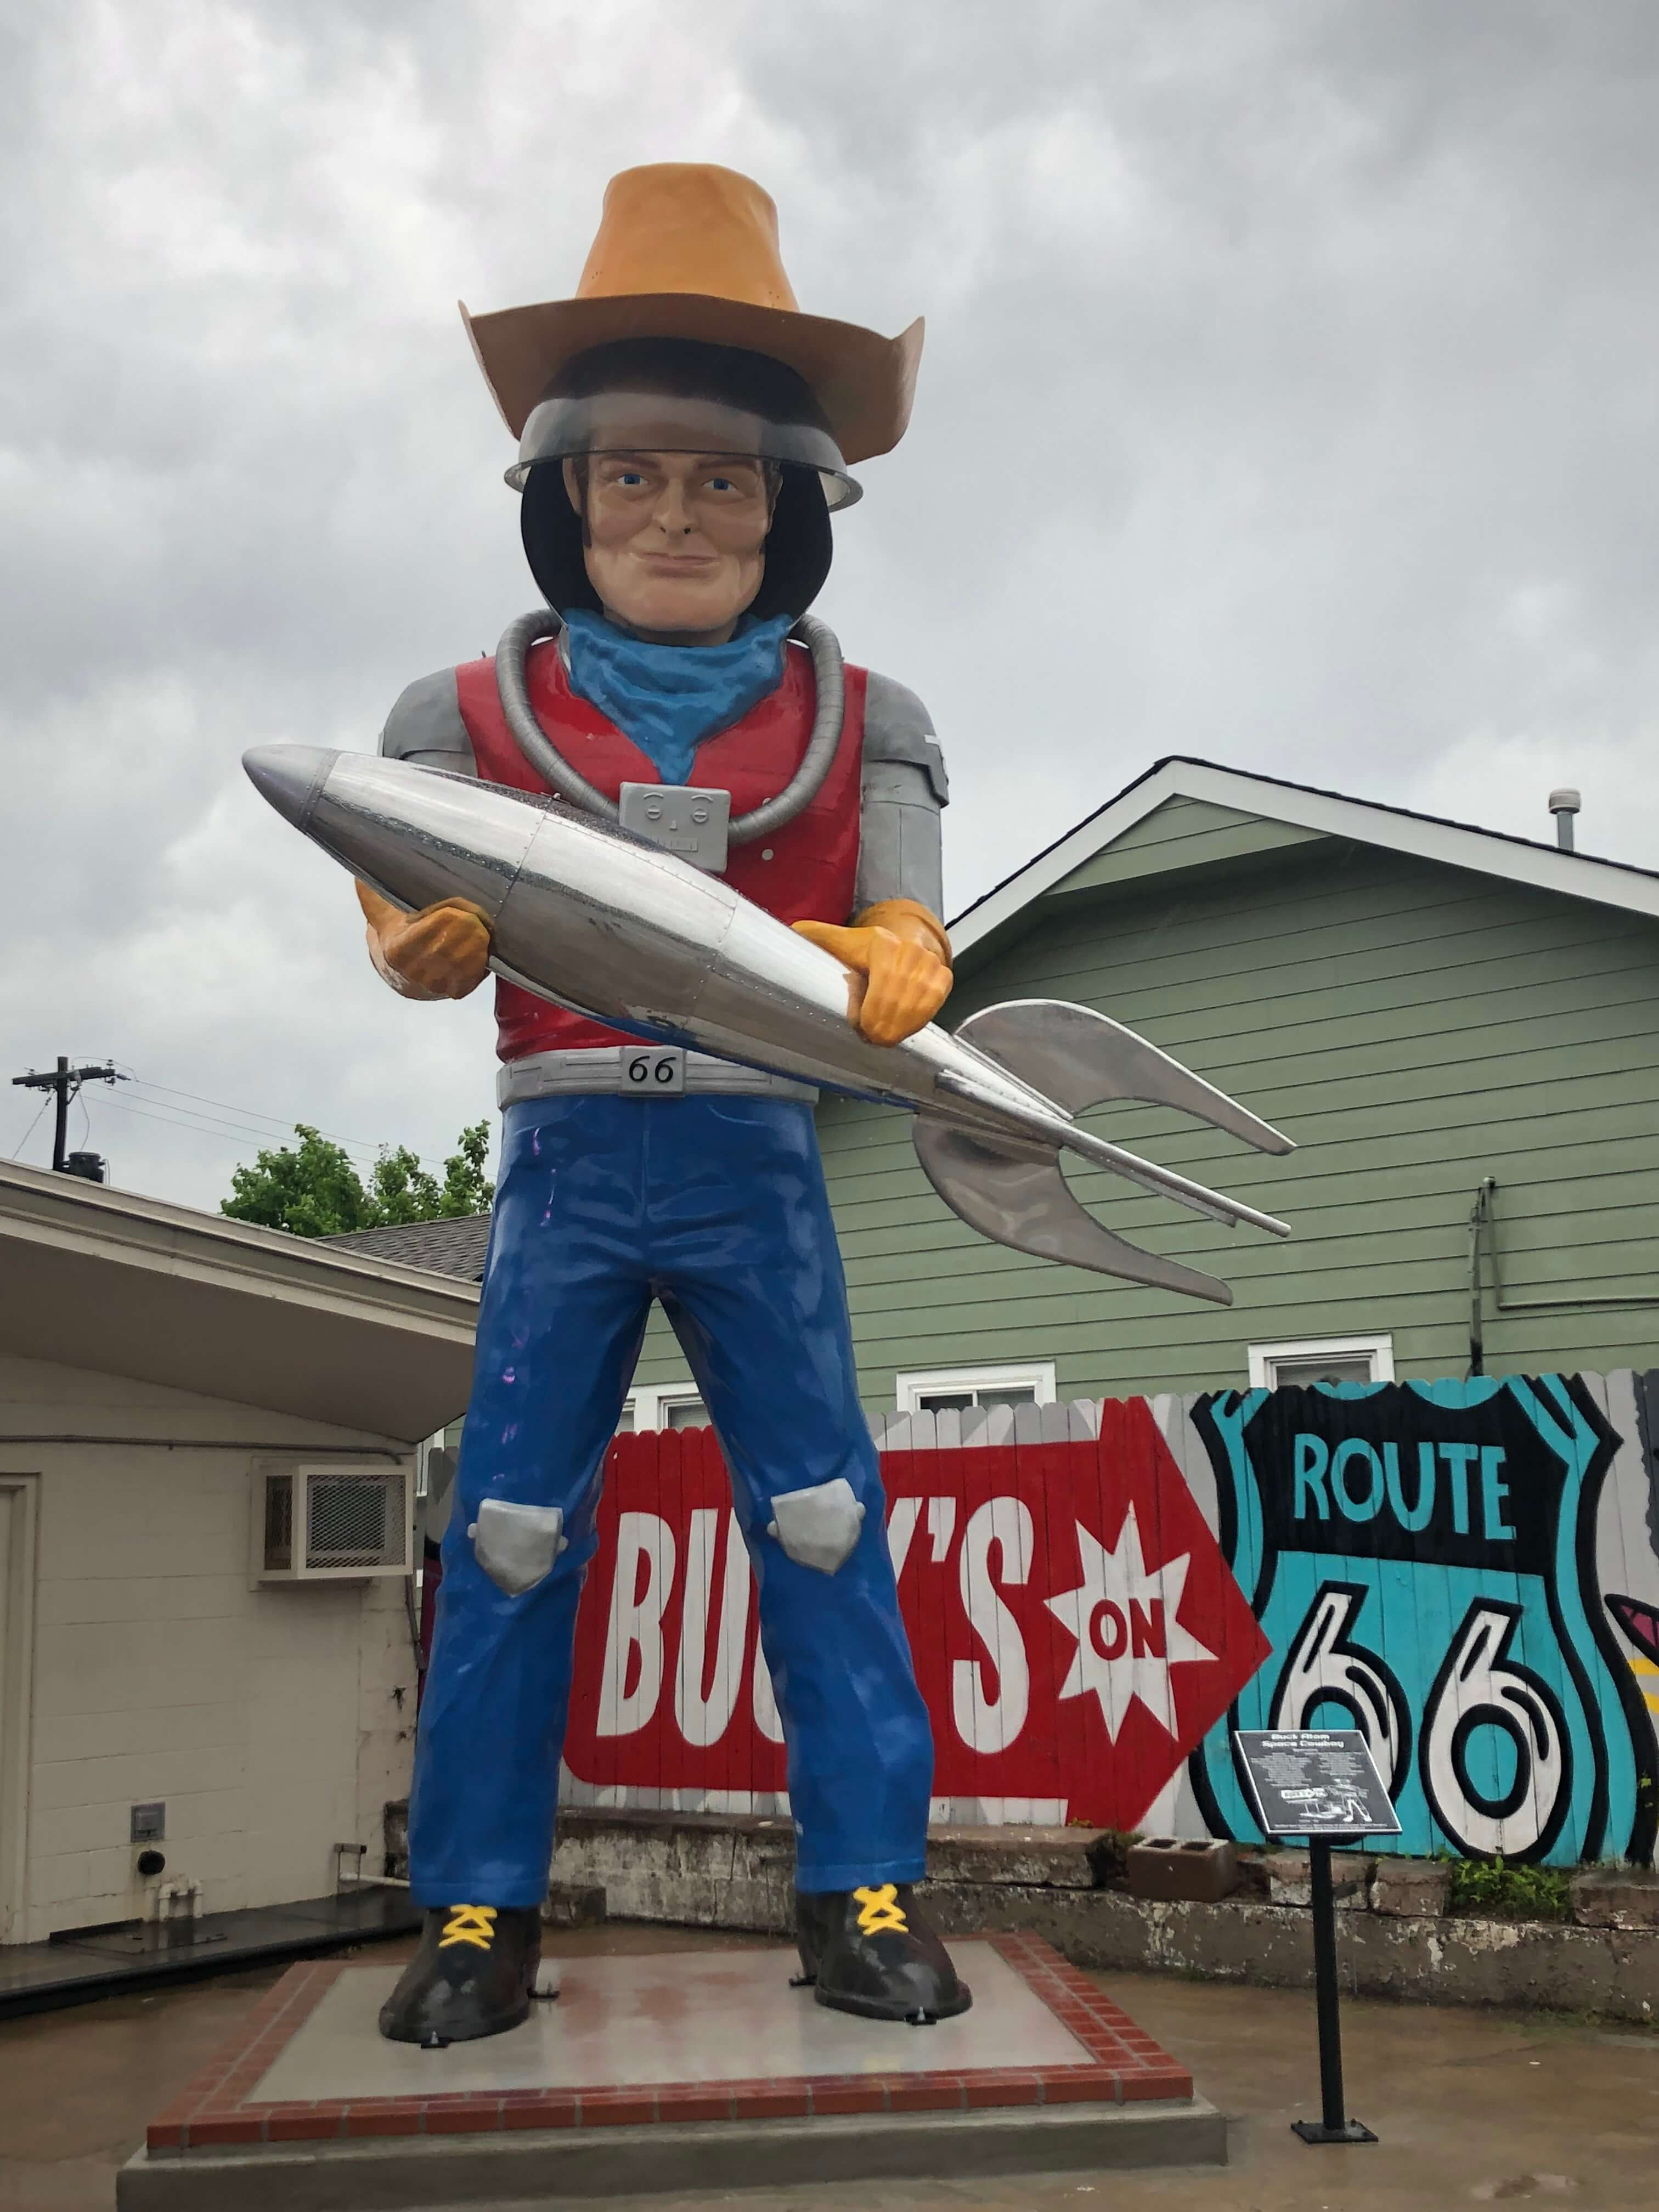 Bucks by Route 66.